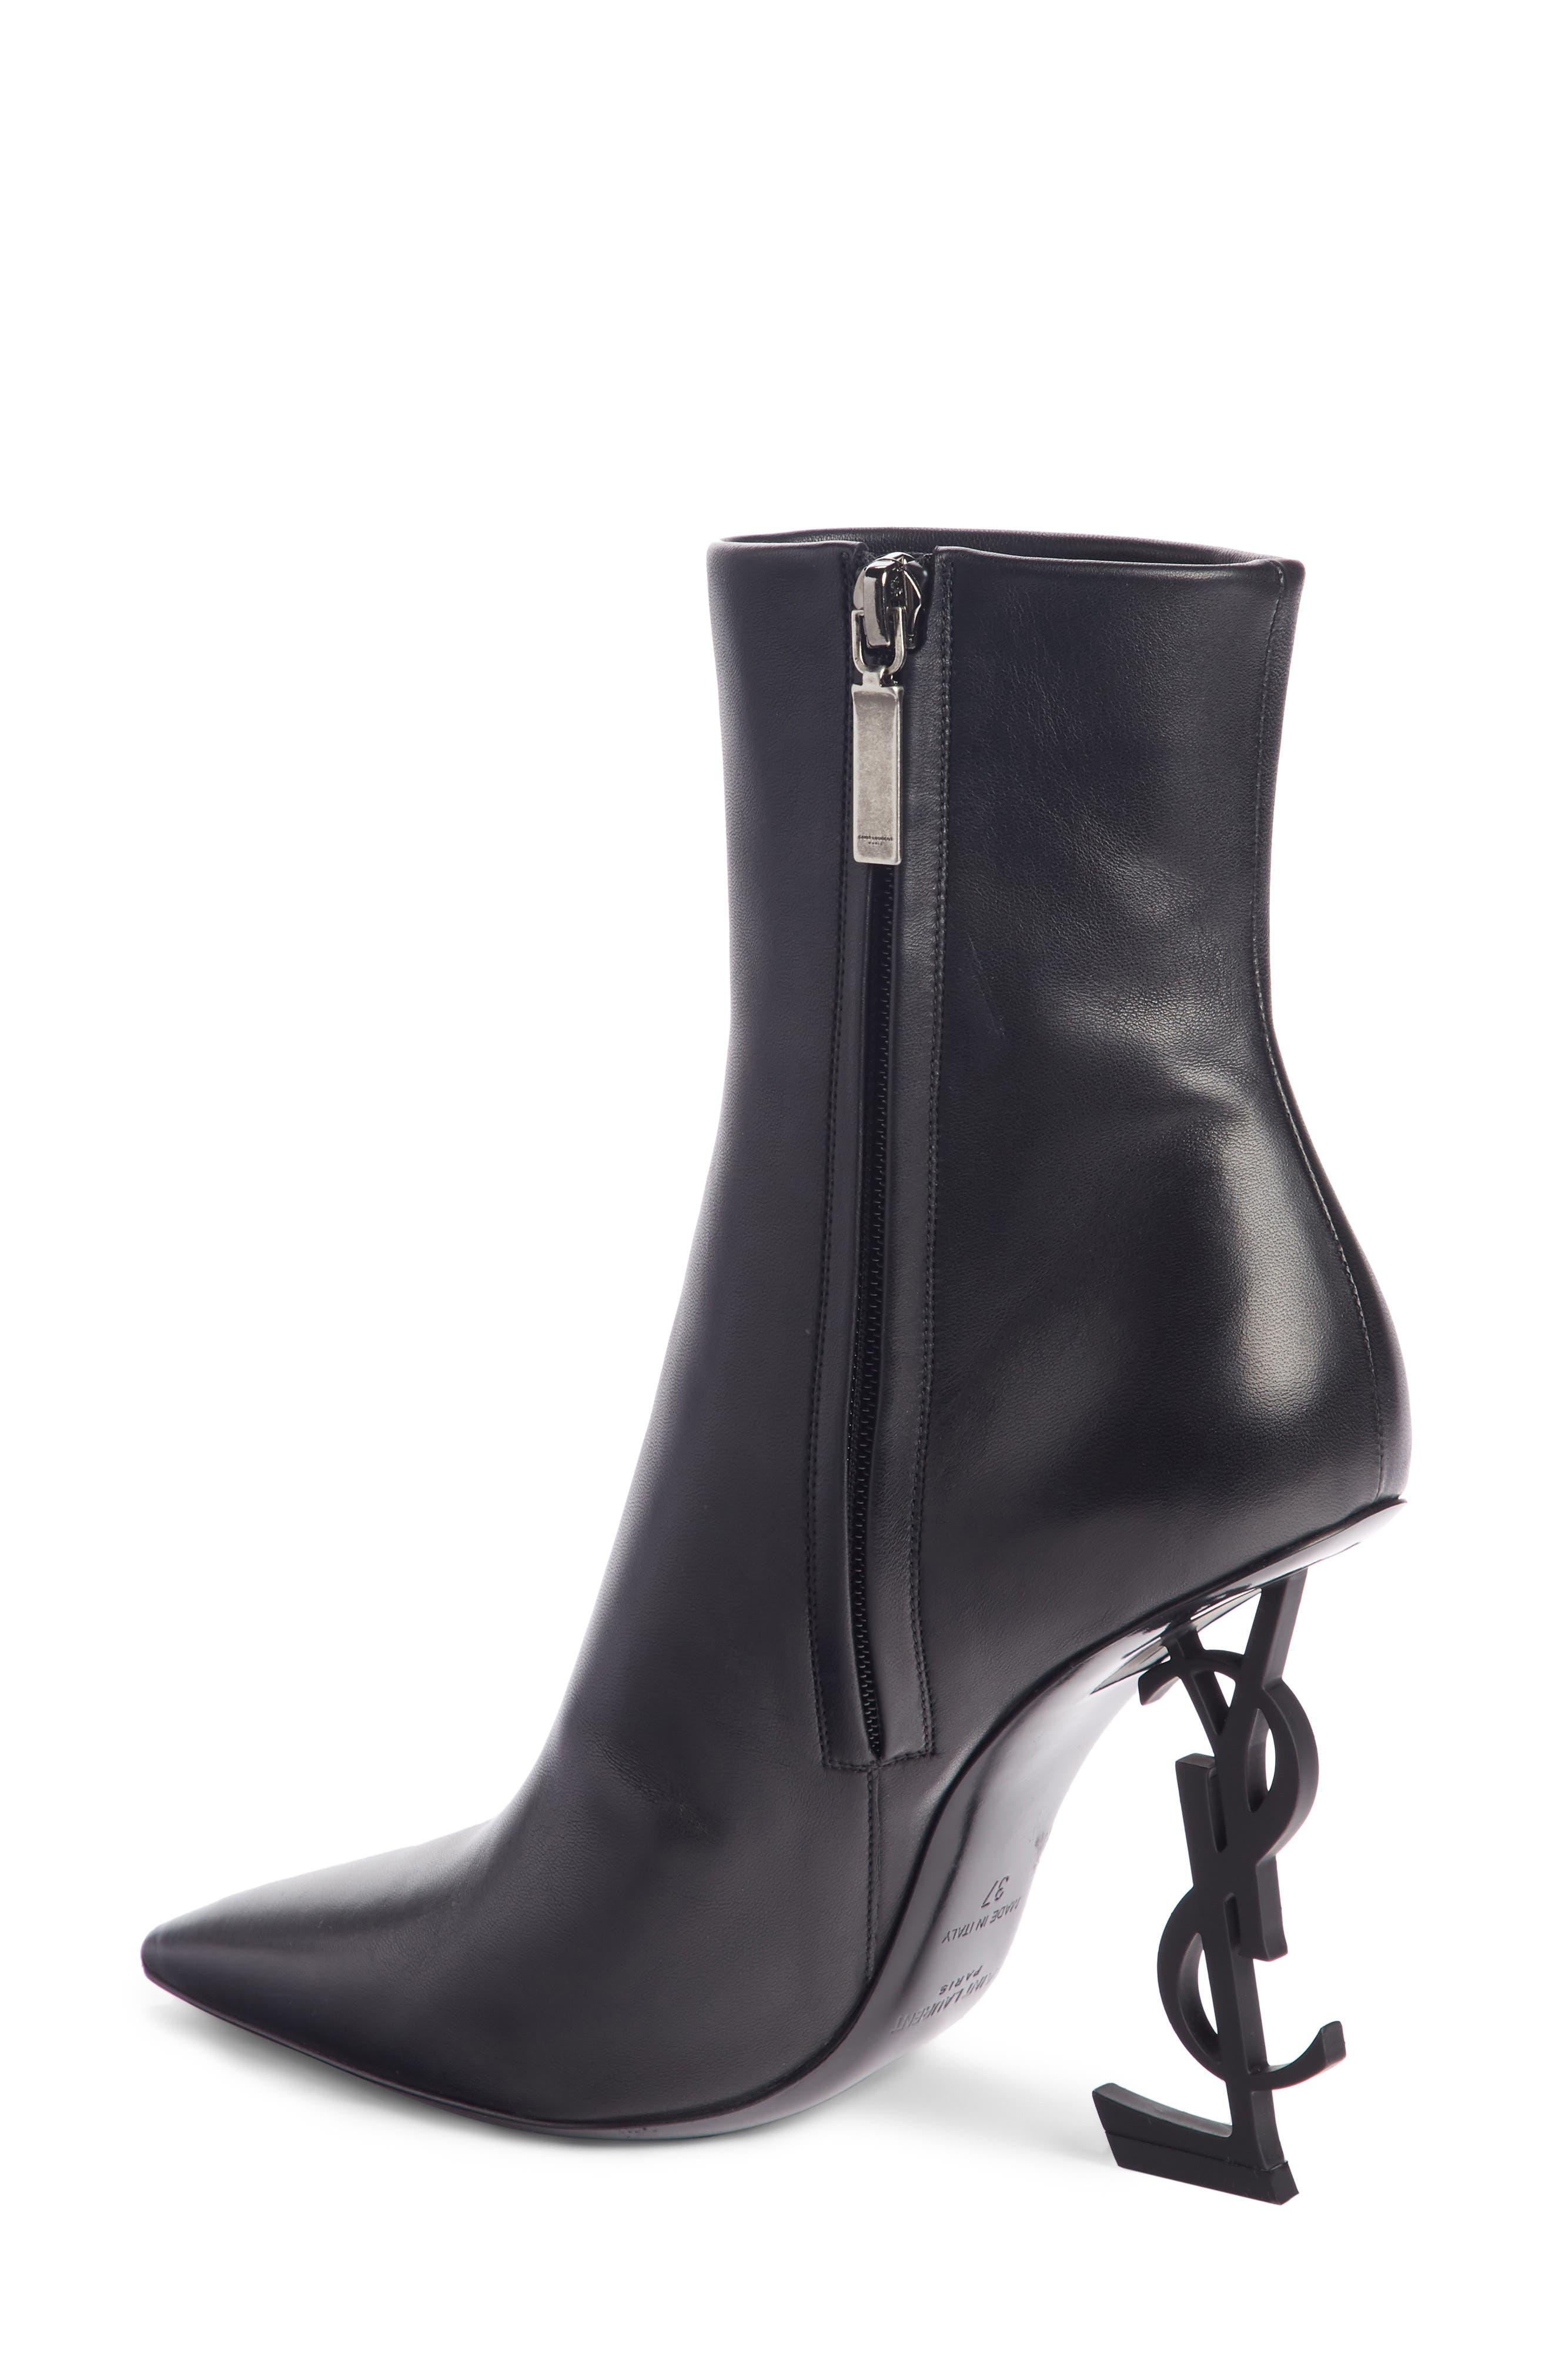 a68eefc61ac yves saint laurent boots   Nordstrom